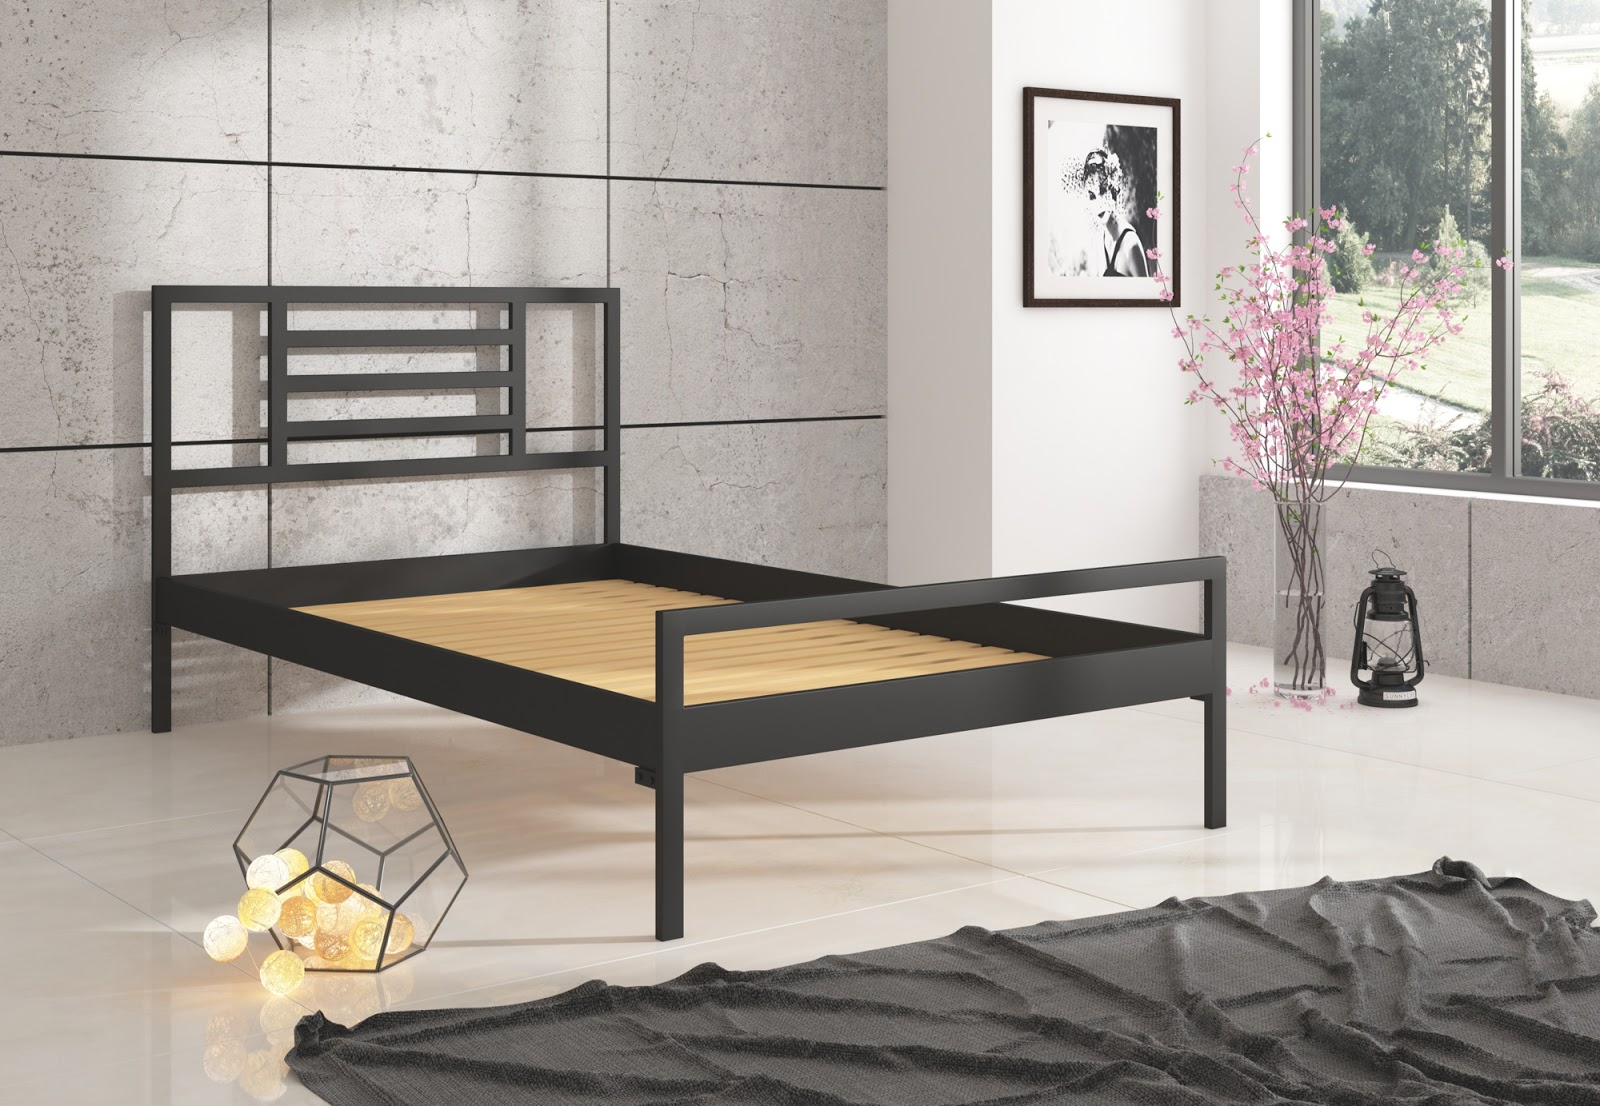 Łóżko metalowe wzór 33 (120-160 cm)